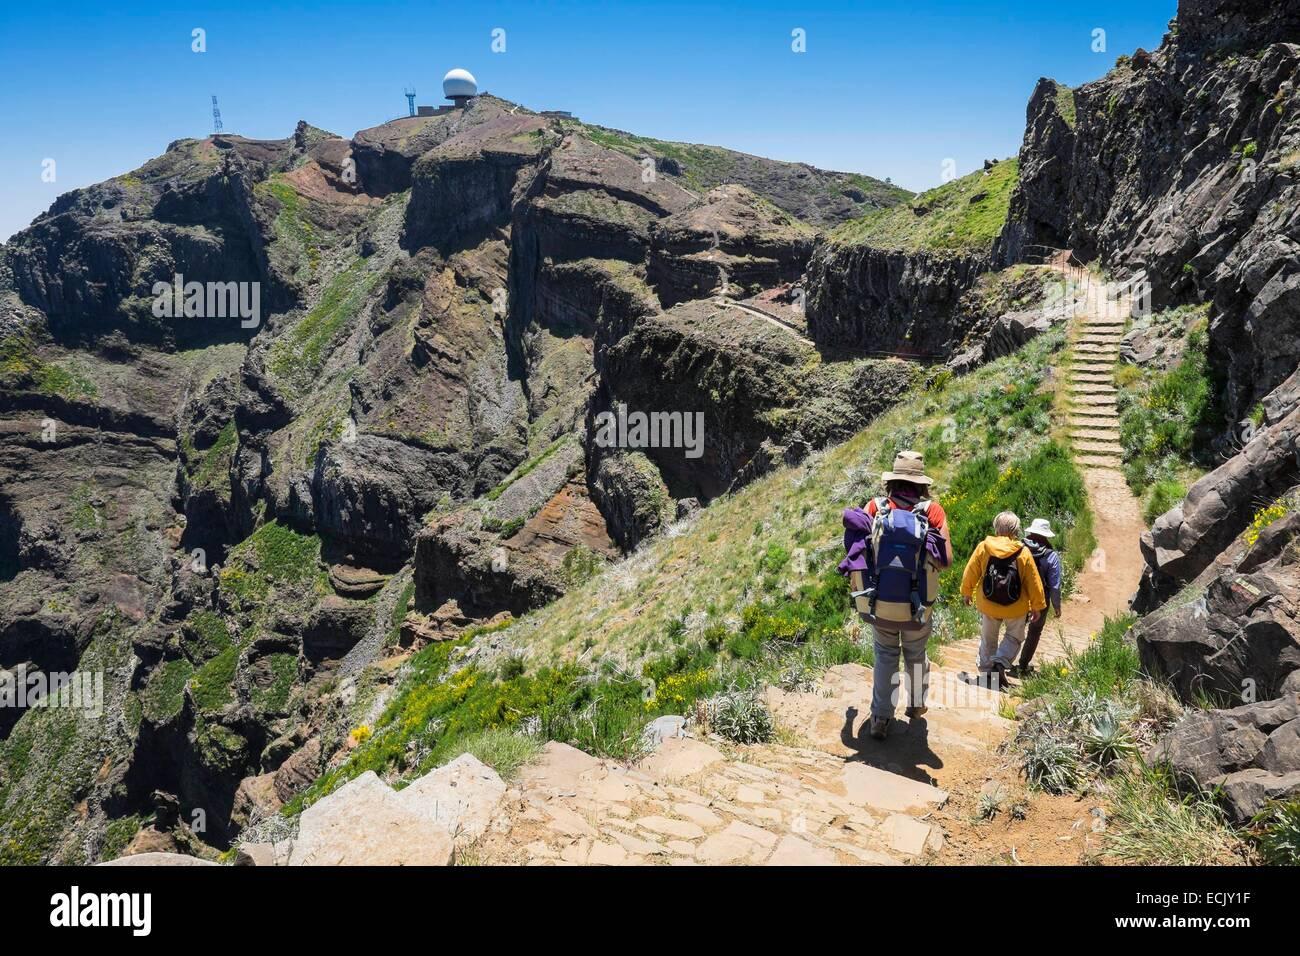 A >> Portugal, Madeira island, hike between Pico Ruivo and Pico Arieiro Stock Photo, Royalty Free ...